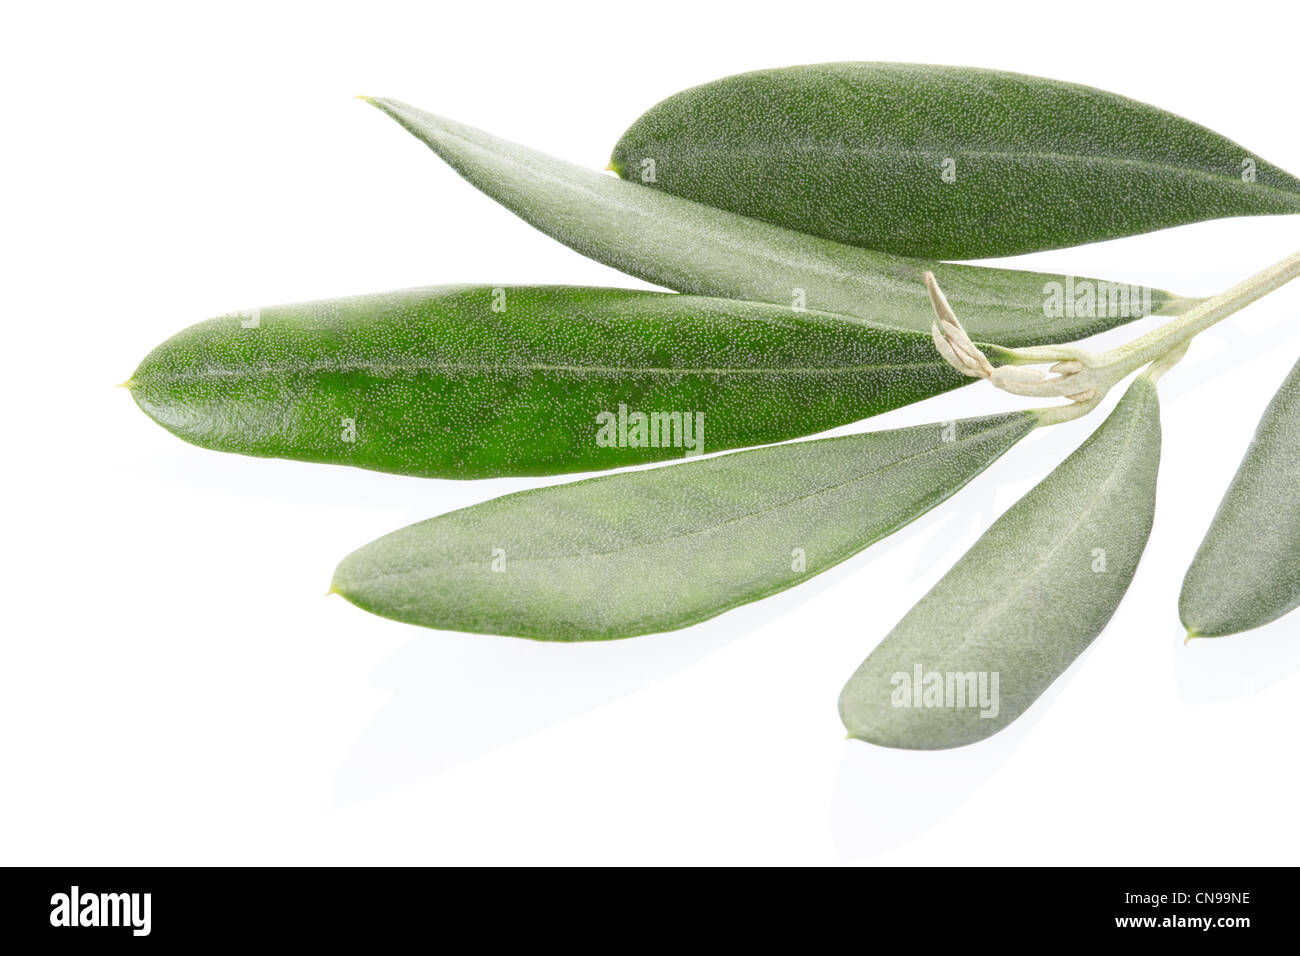 Olive twig - Stock Image